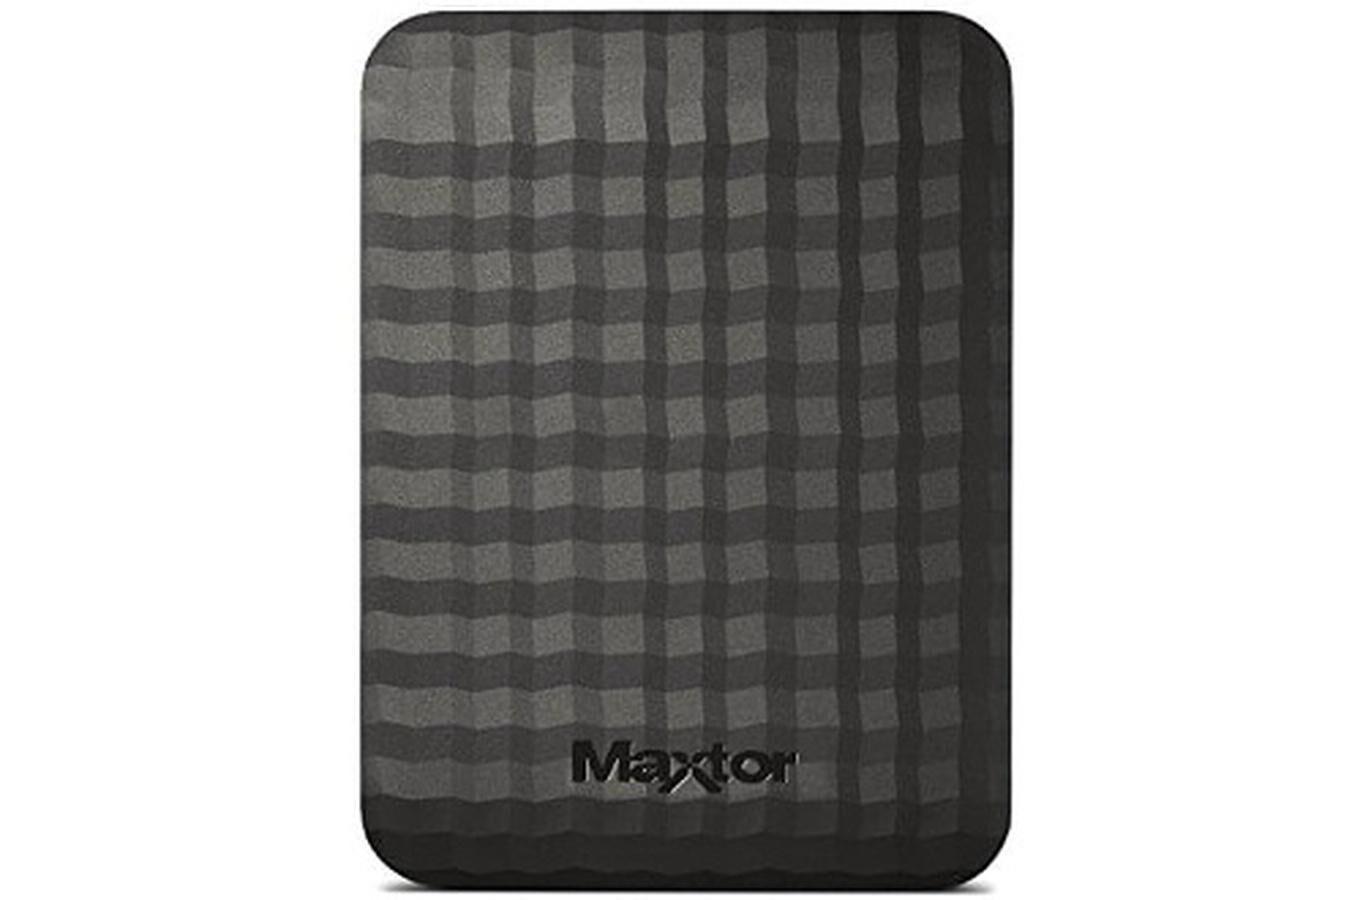 MAXTOR M3 500 Go Disque dur - externe (portable) USB 3.0